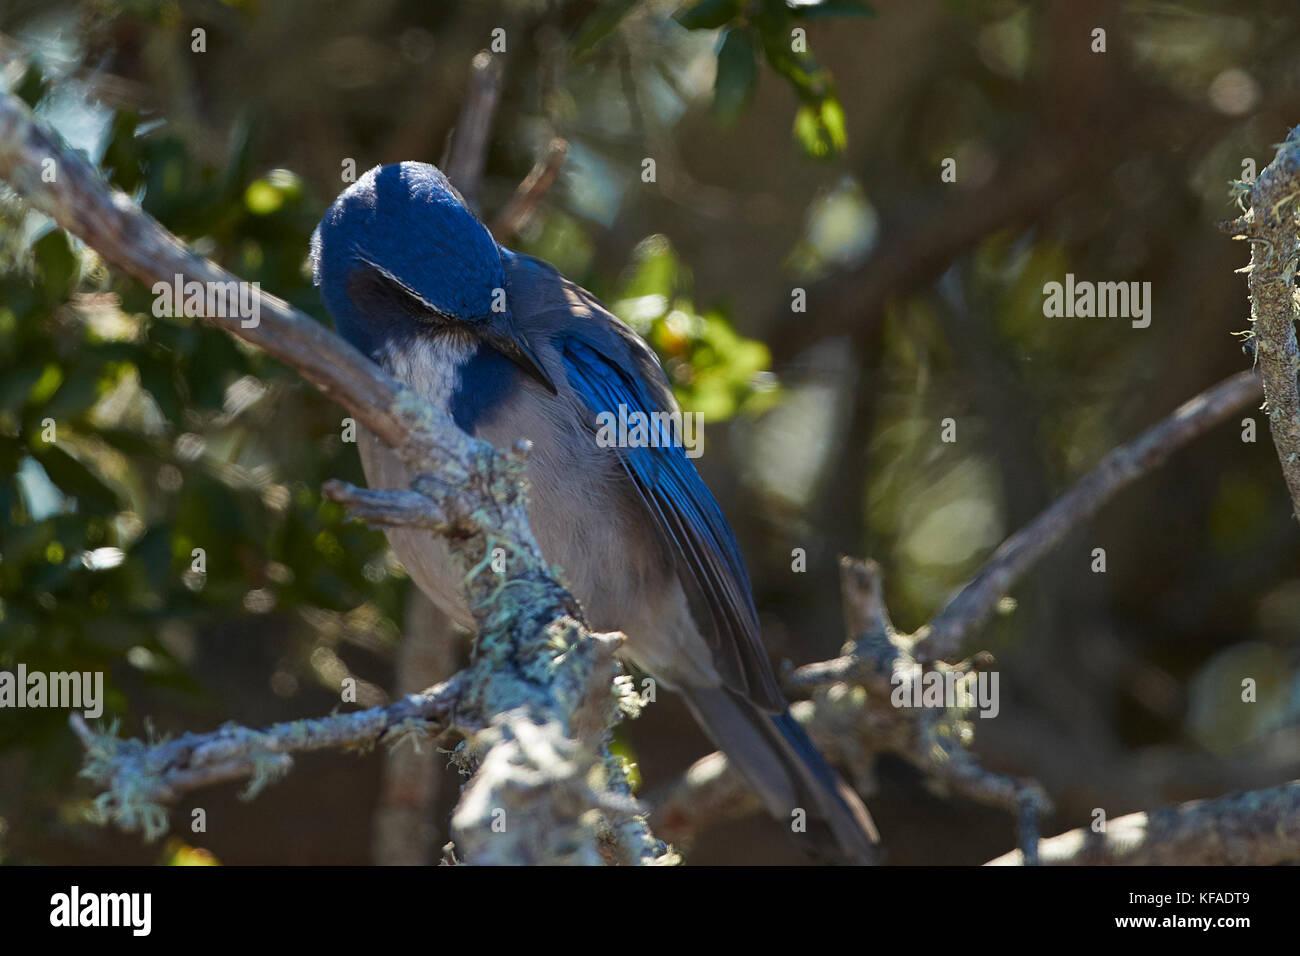 California Scrub Jay (Aphelocoma Californica), Perched On A Shrub On Angel Island, California. Stock Photo